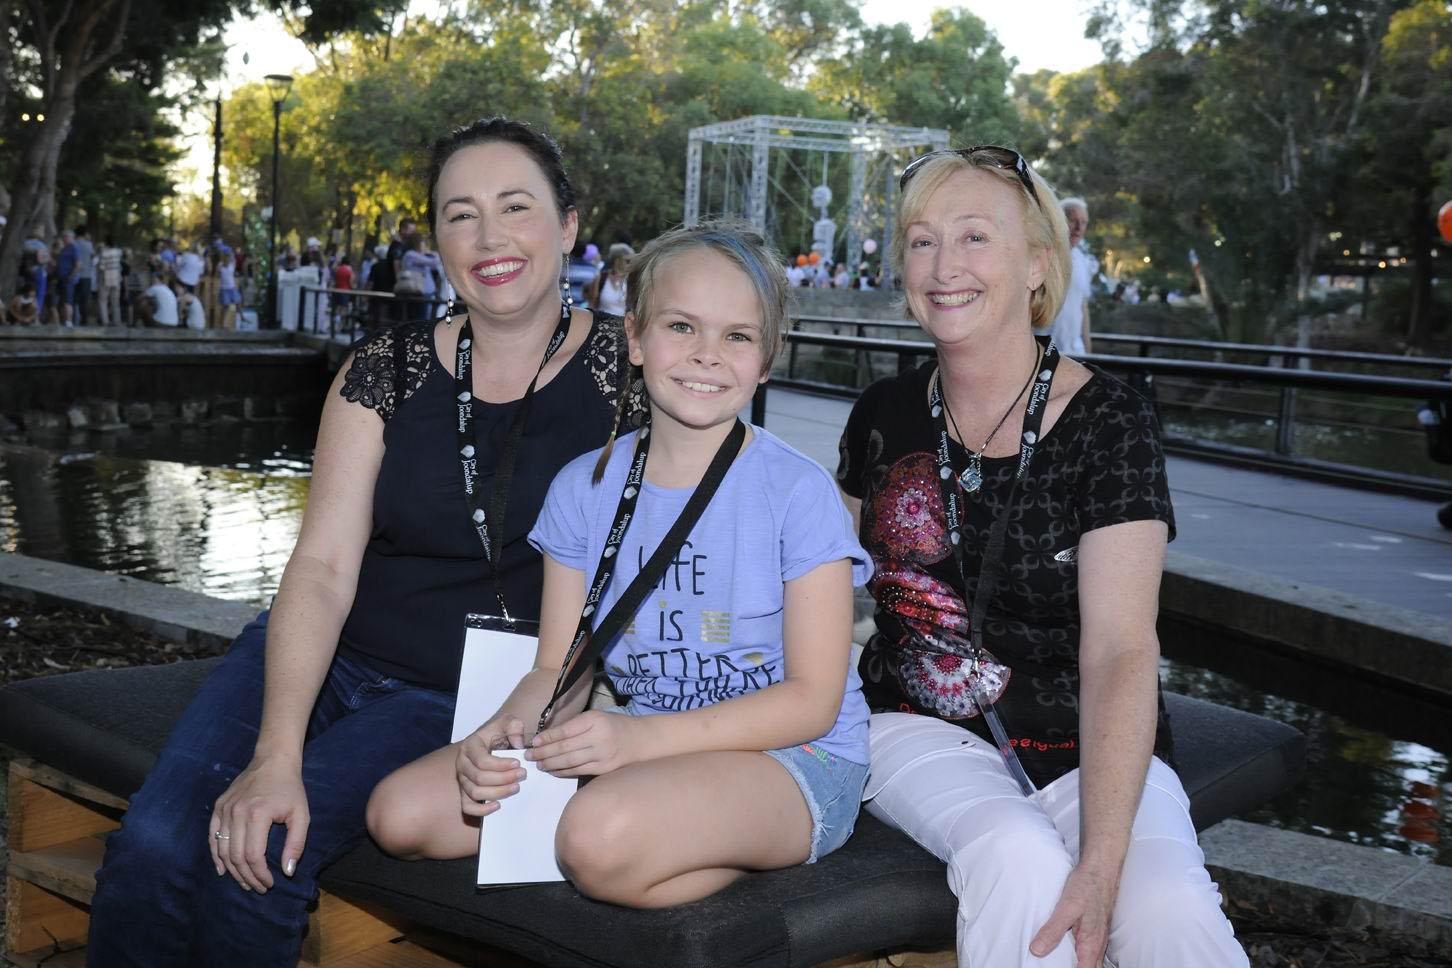 Aisha Timol, Hana Timol and Helen Brook. Pictures: Chris Kershaw